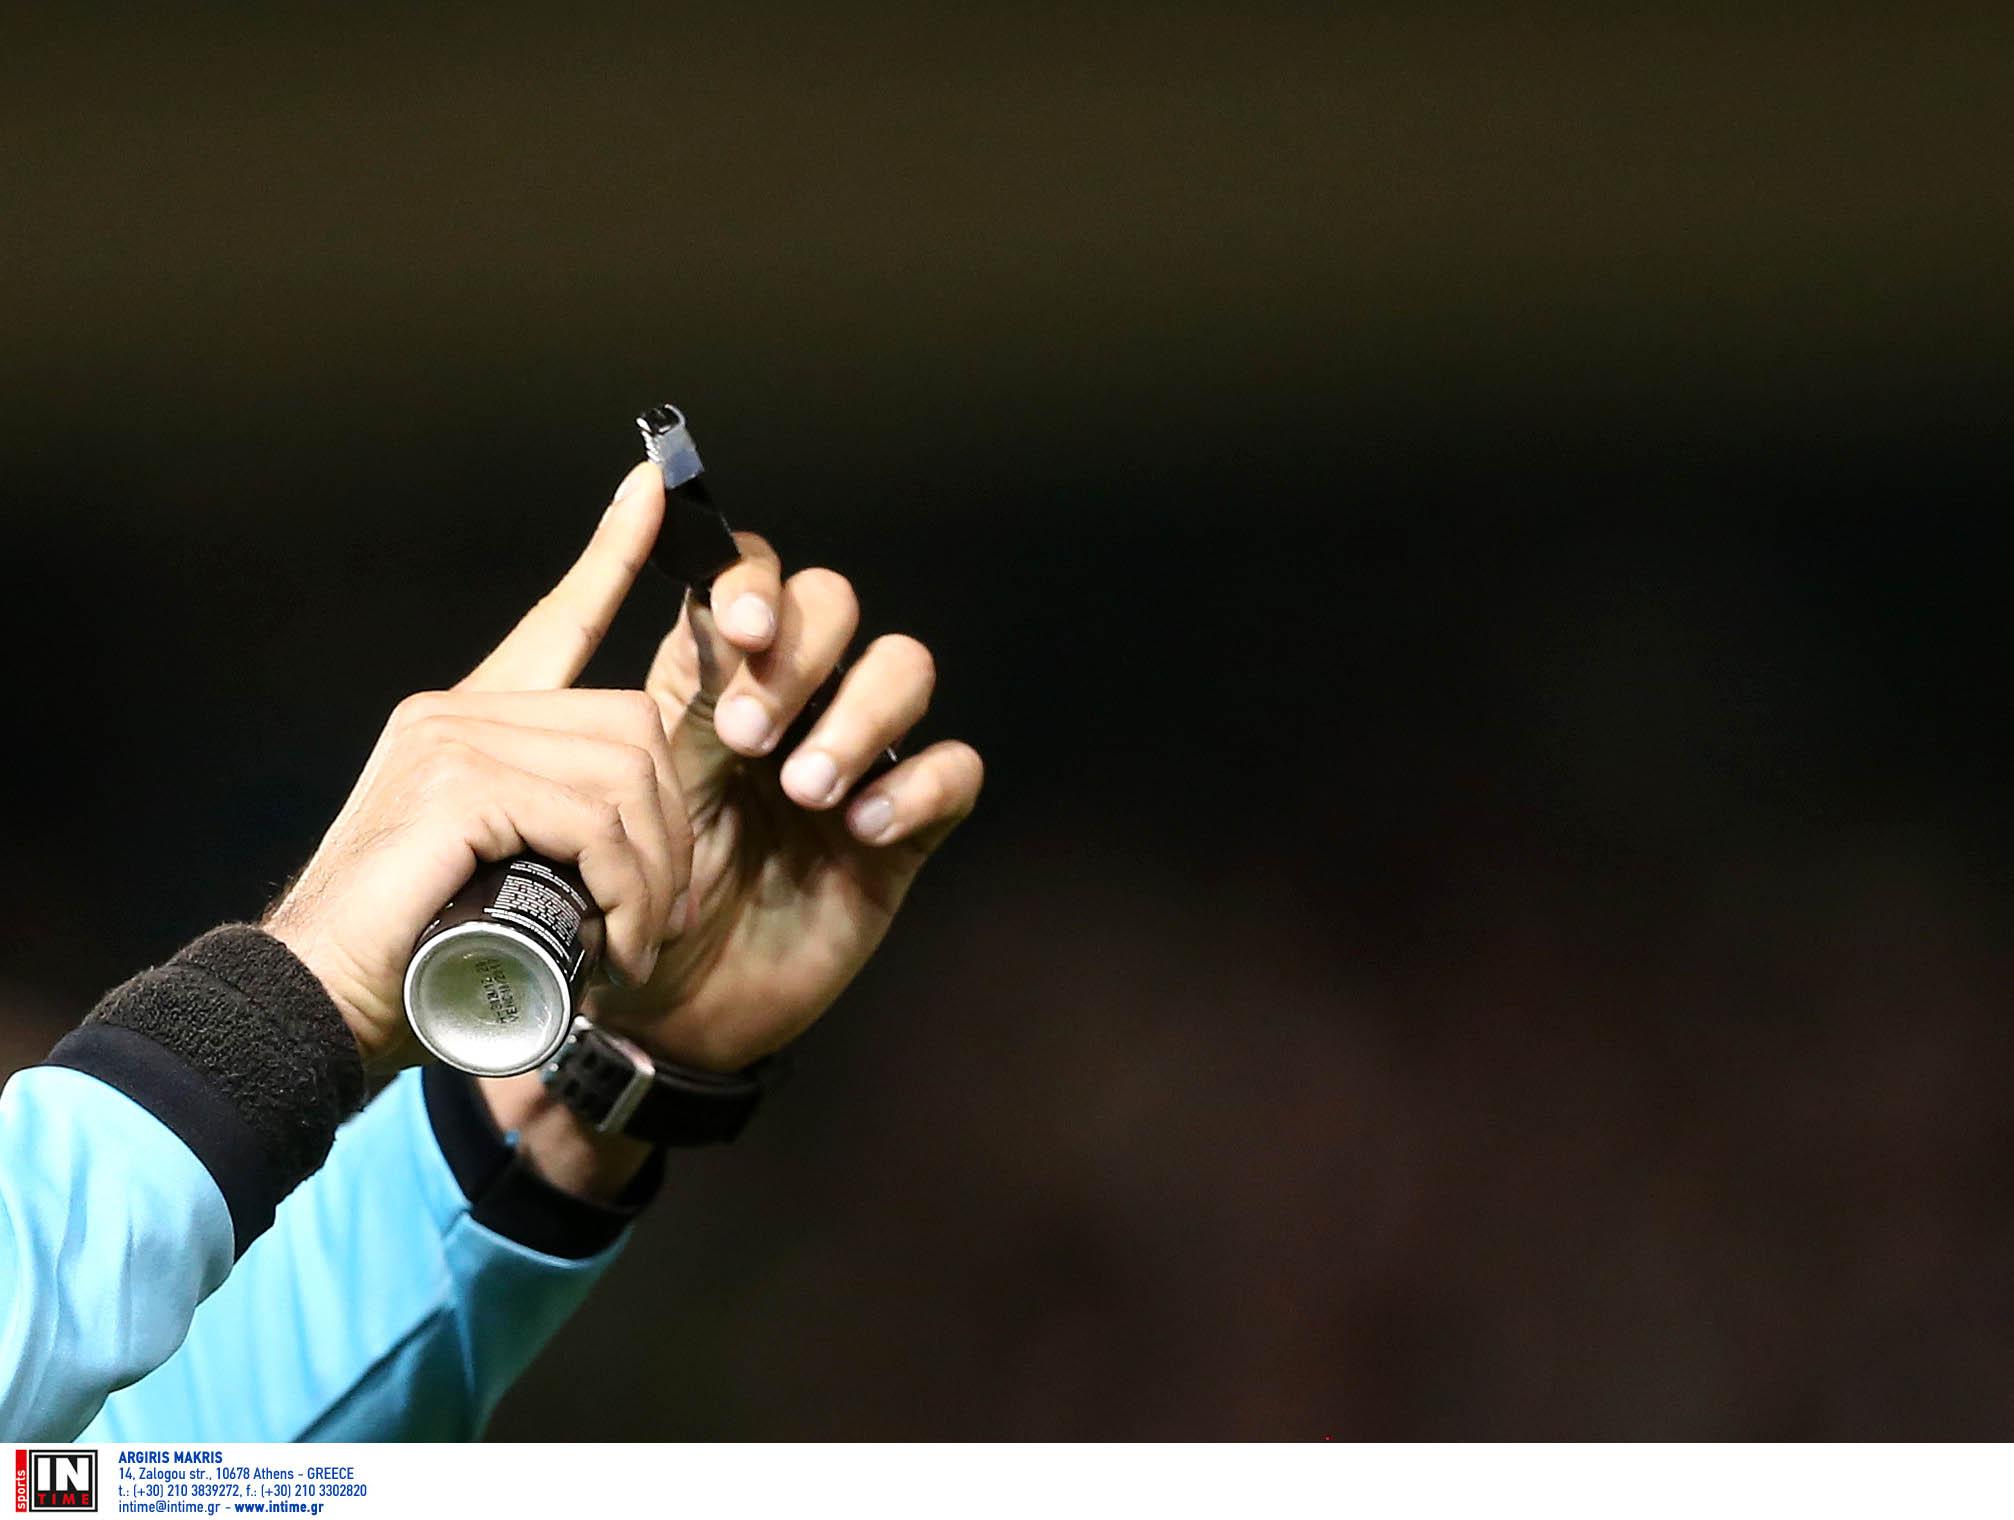 Superleague: Αυτοί είναι διαιτητές της νέας σεζόν – «Έκοψε» 7 ο Κλάτενμπεργκ, δεν προβίβασε κανέναν